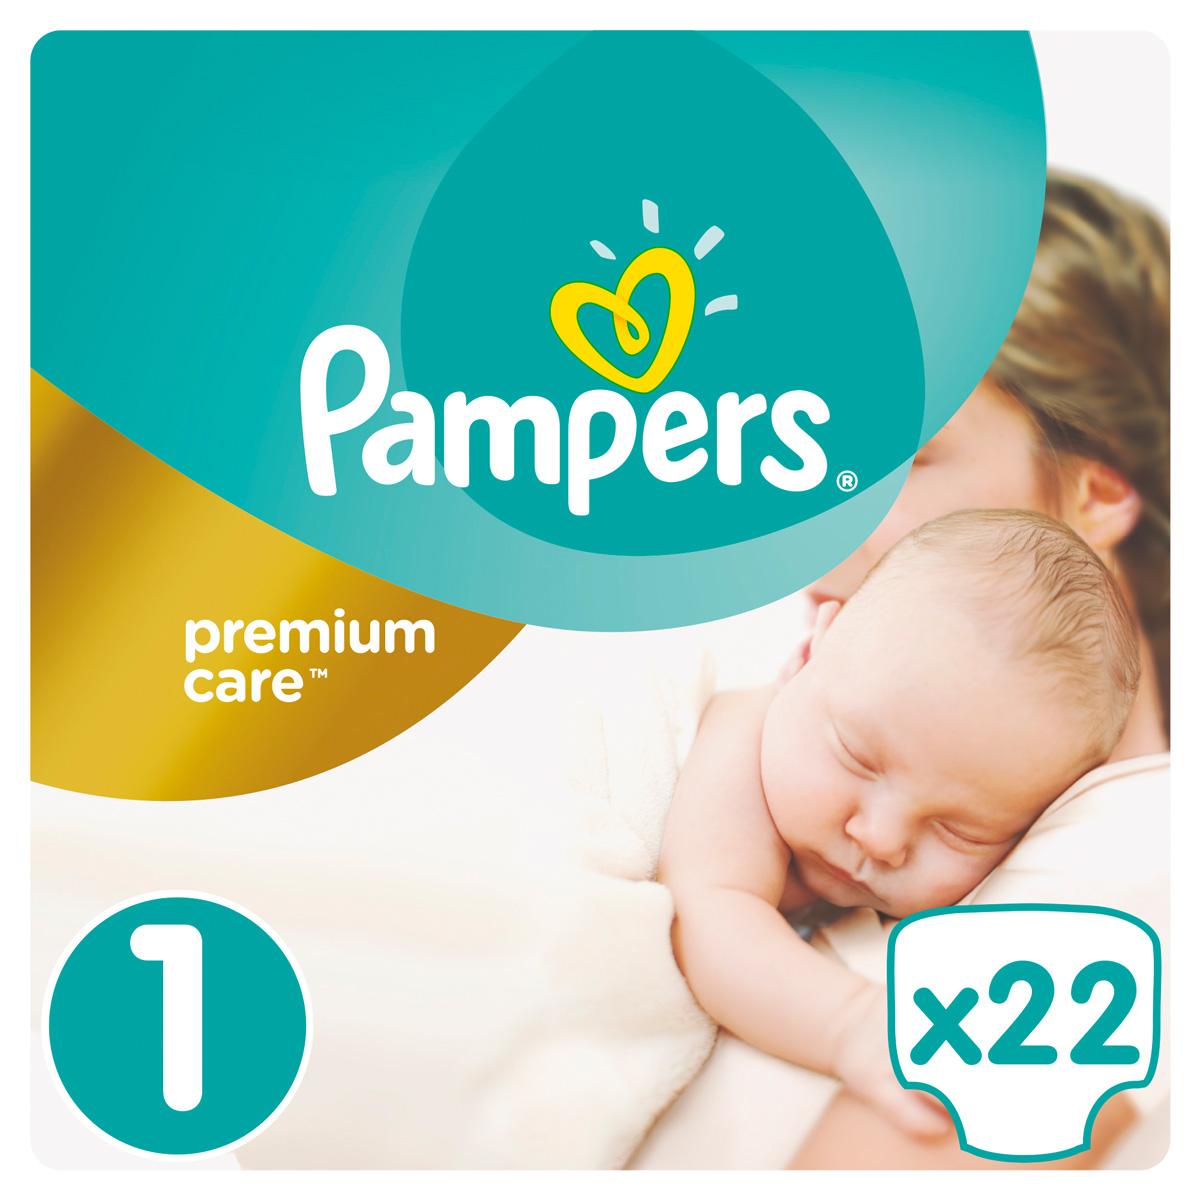 Pampers Подгузники Premium Care 2-5 кг (размер 1) 22 шт подгузники детские pampers подгузники pampers premium care 2 5 кг 1 размер 88 шт